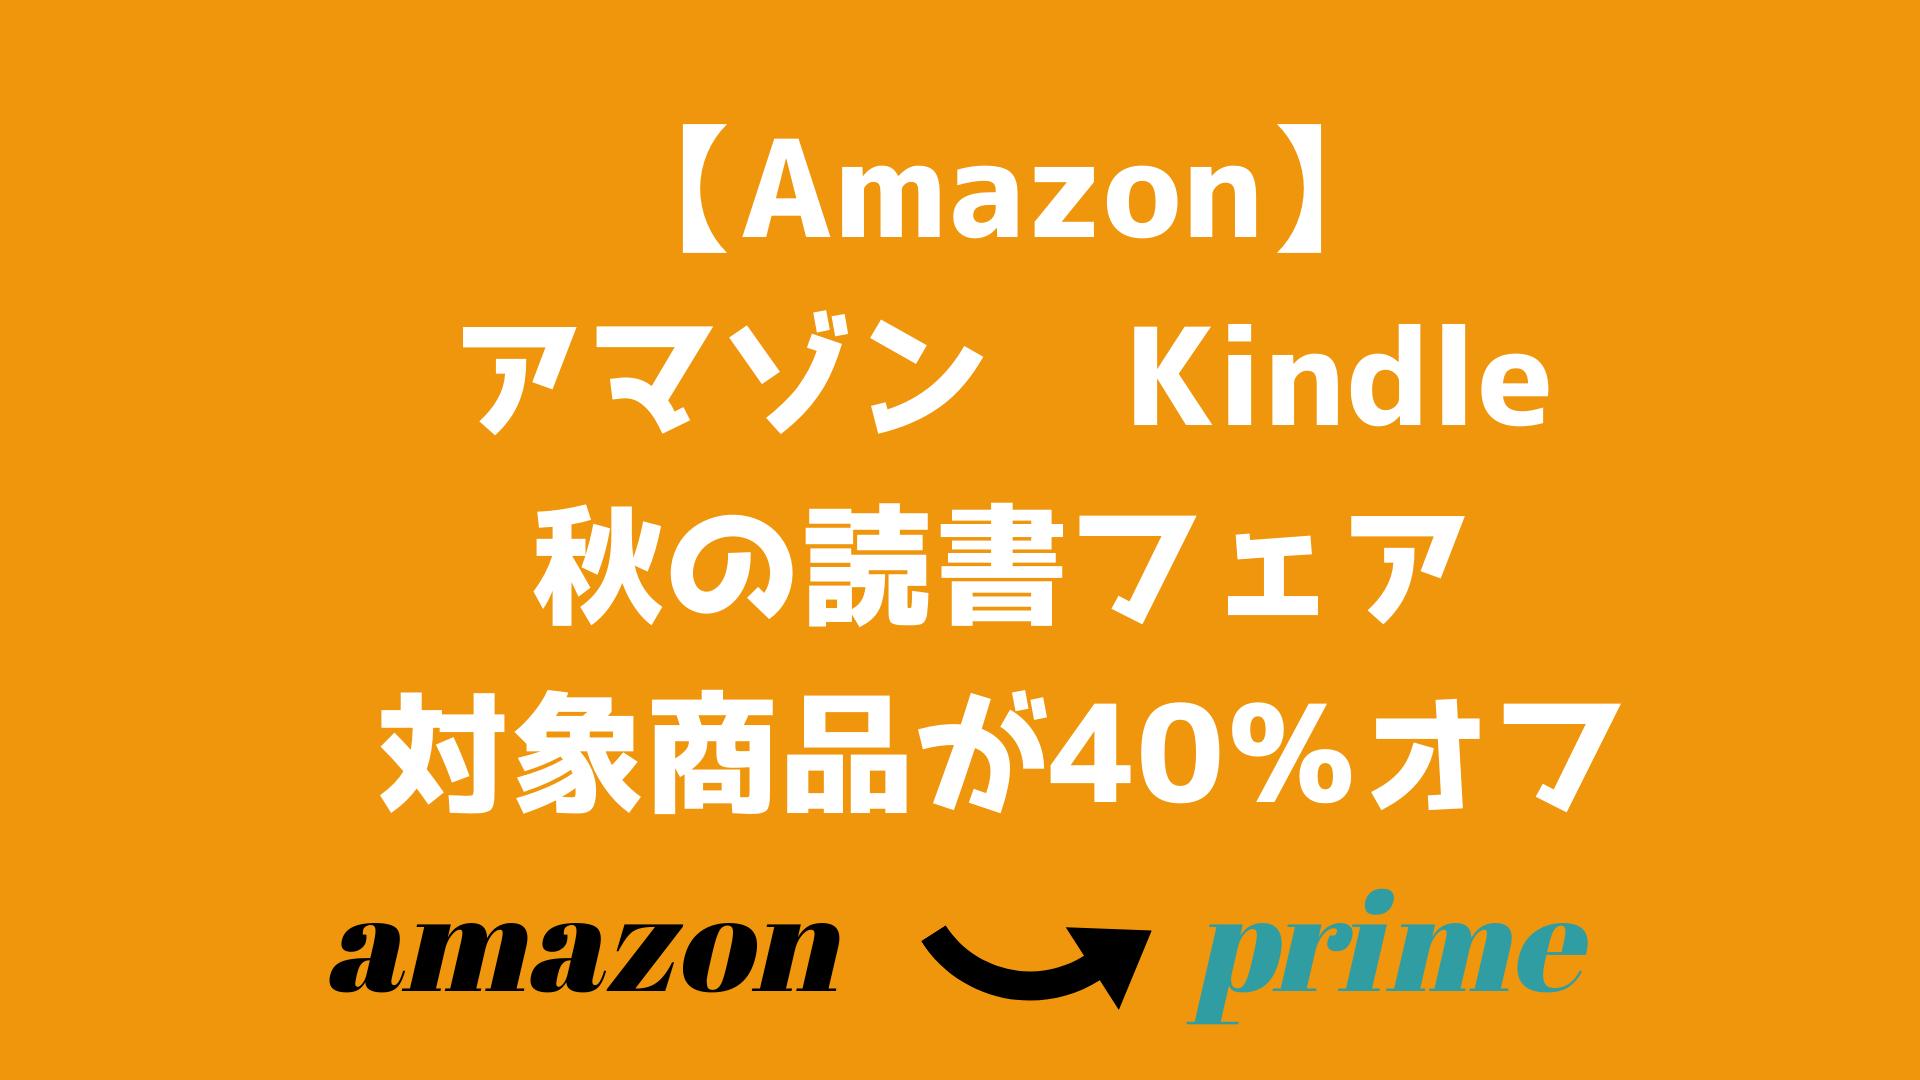 【Amazon】アマゾン Kindle 秋の読書フェア 対象商品が40%オフに